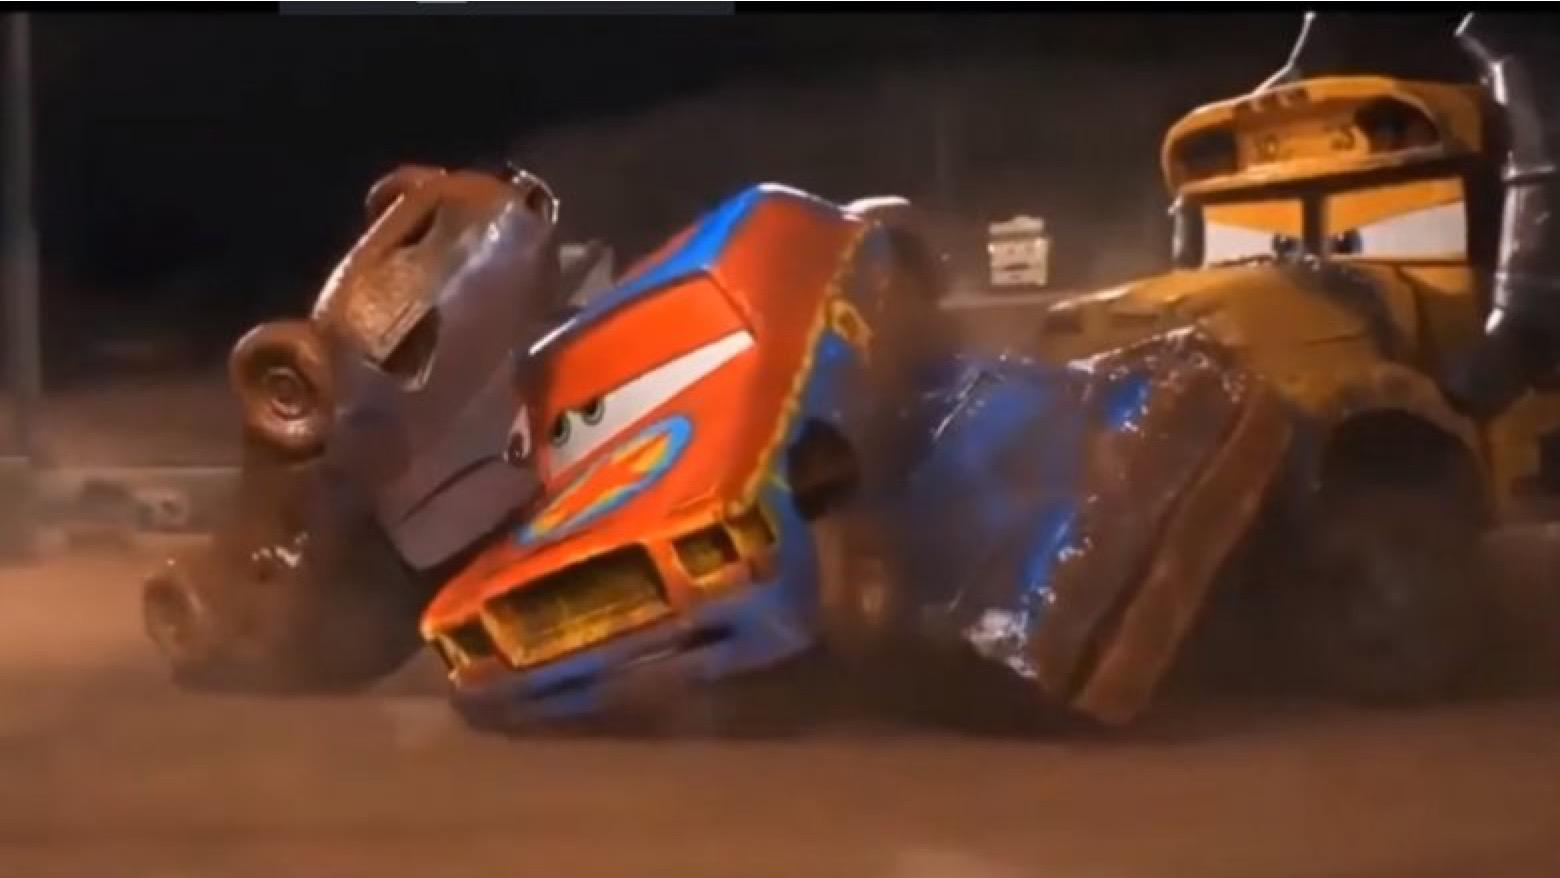 Cars  All Trailers  Pixar Animation